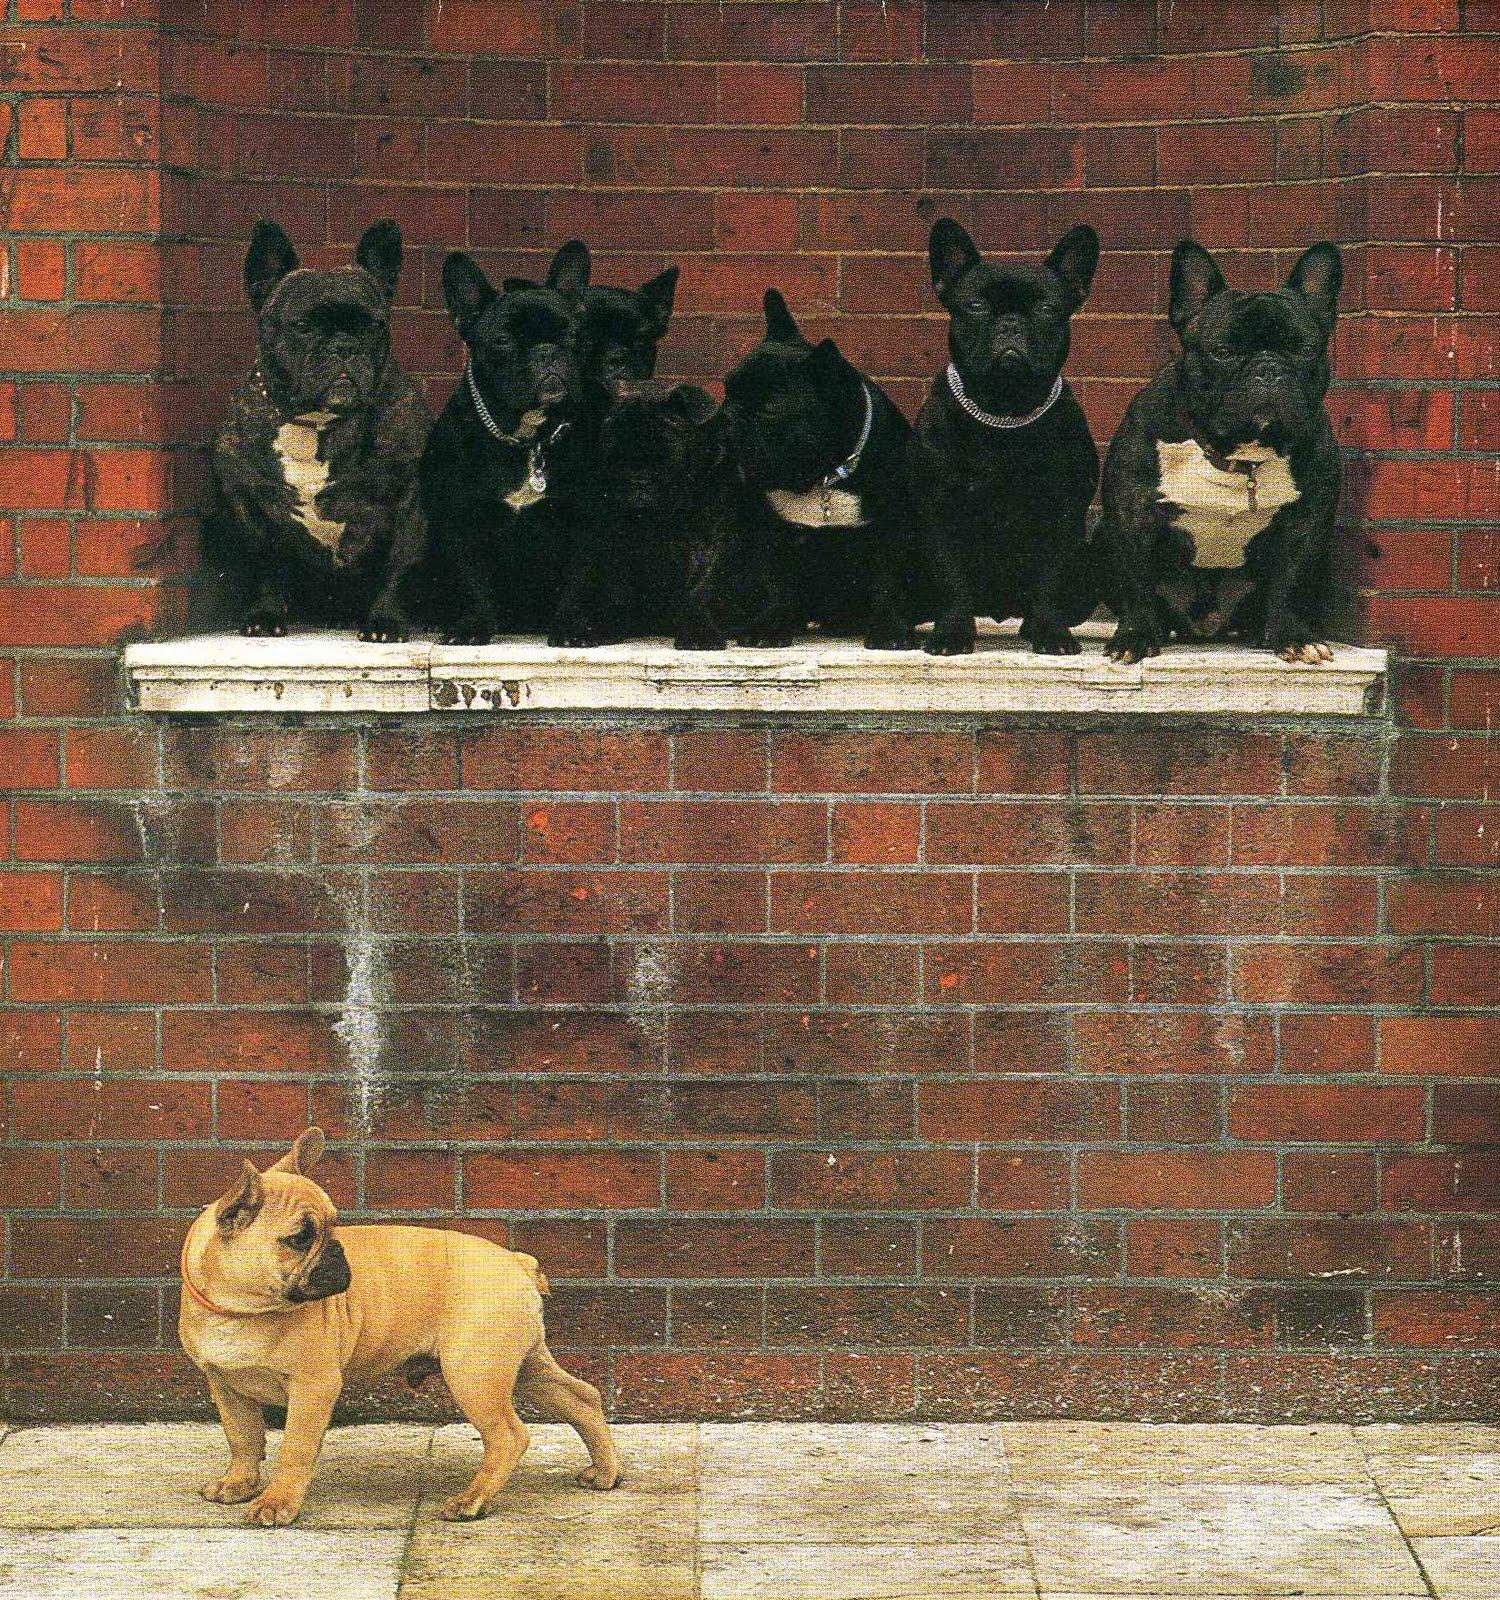 Tan French Bulldog Puppies Sweetest french bulldogs!